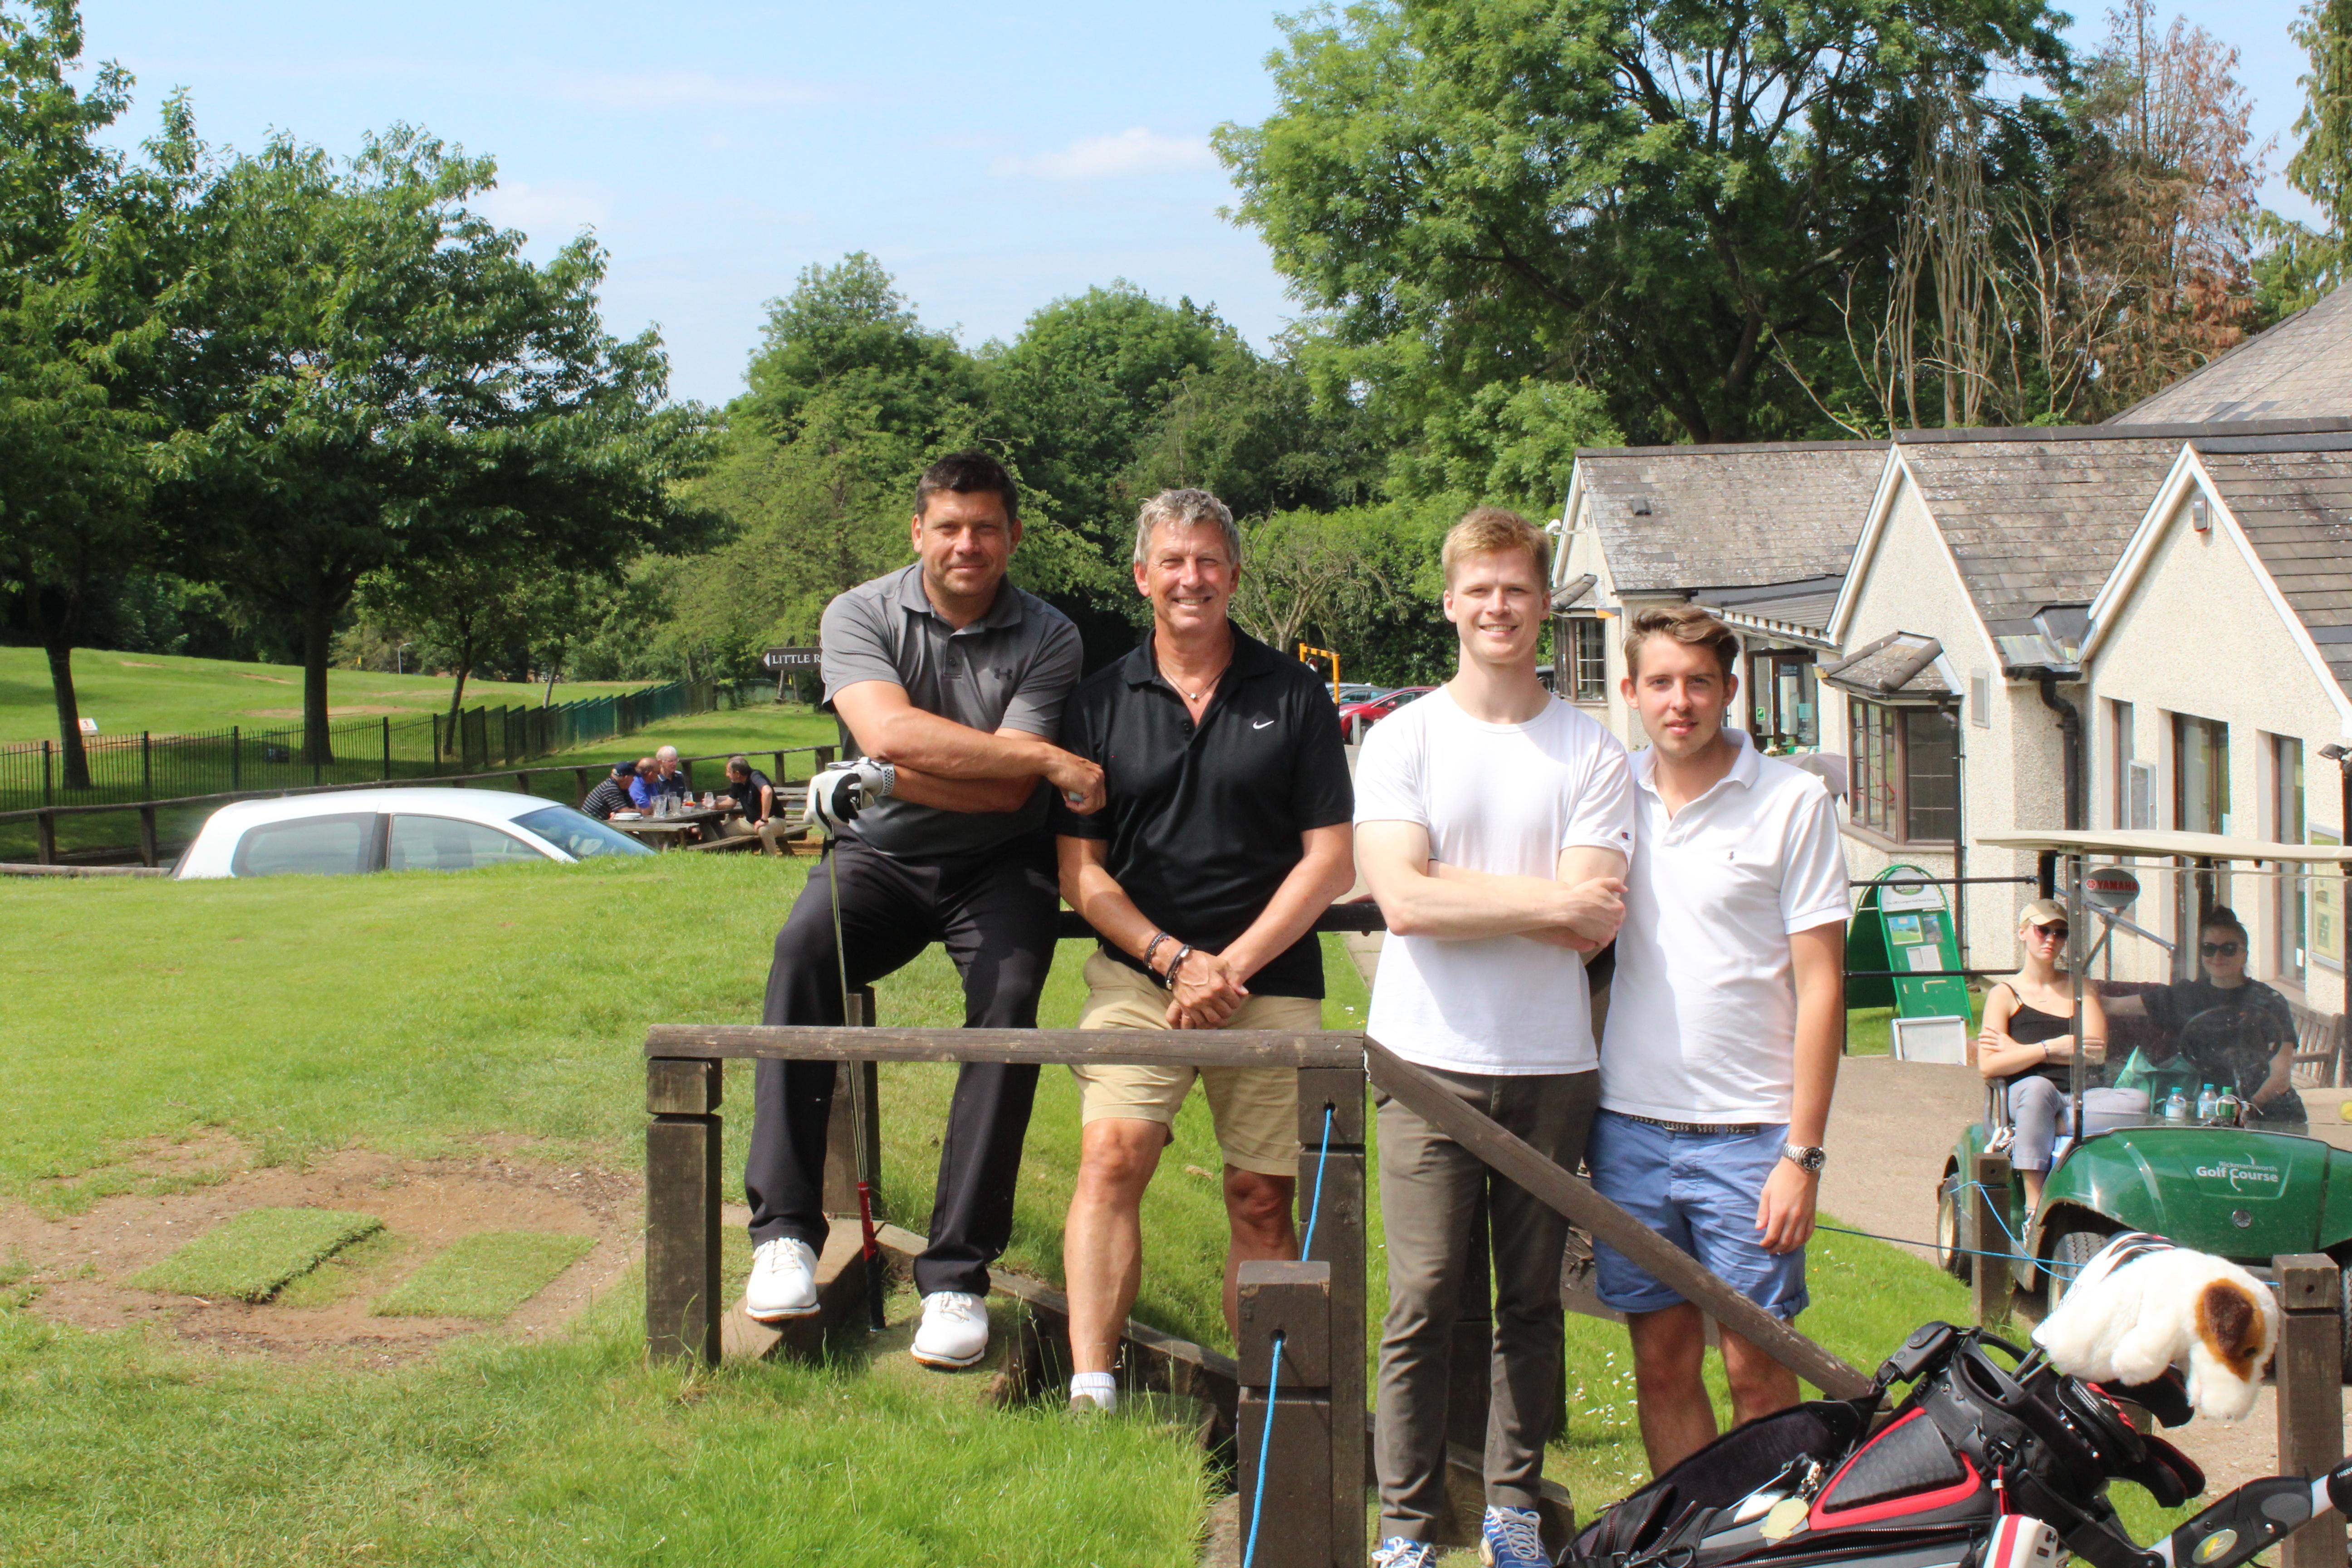 As Wild As 5th Annual Golf Day – Friday 14th June 2019 – Rickmansworth Golf Club